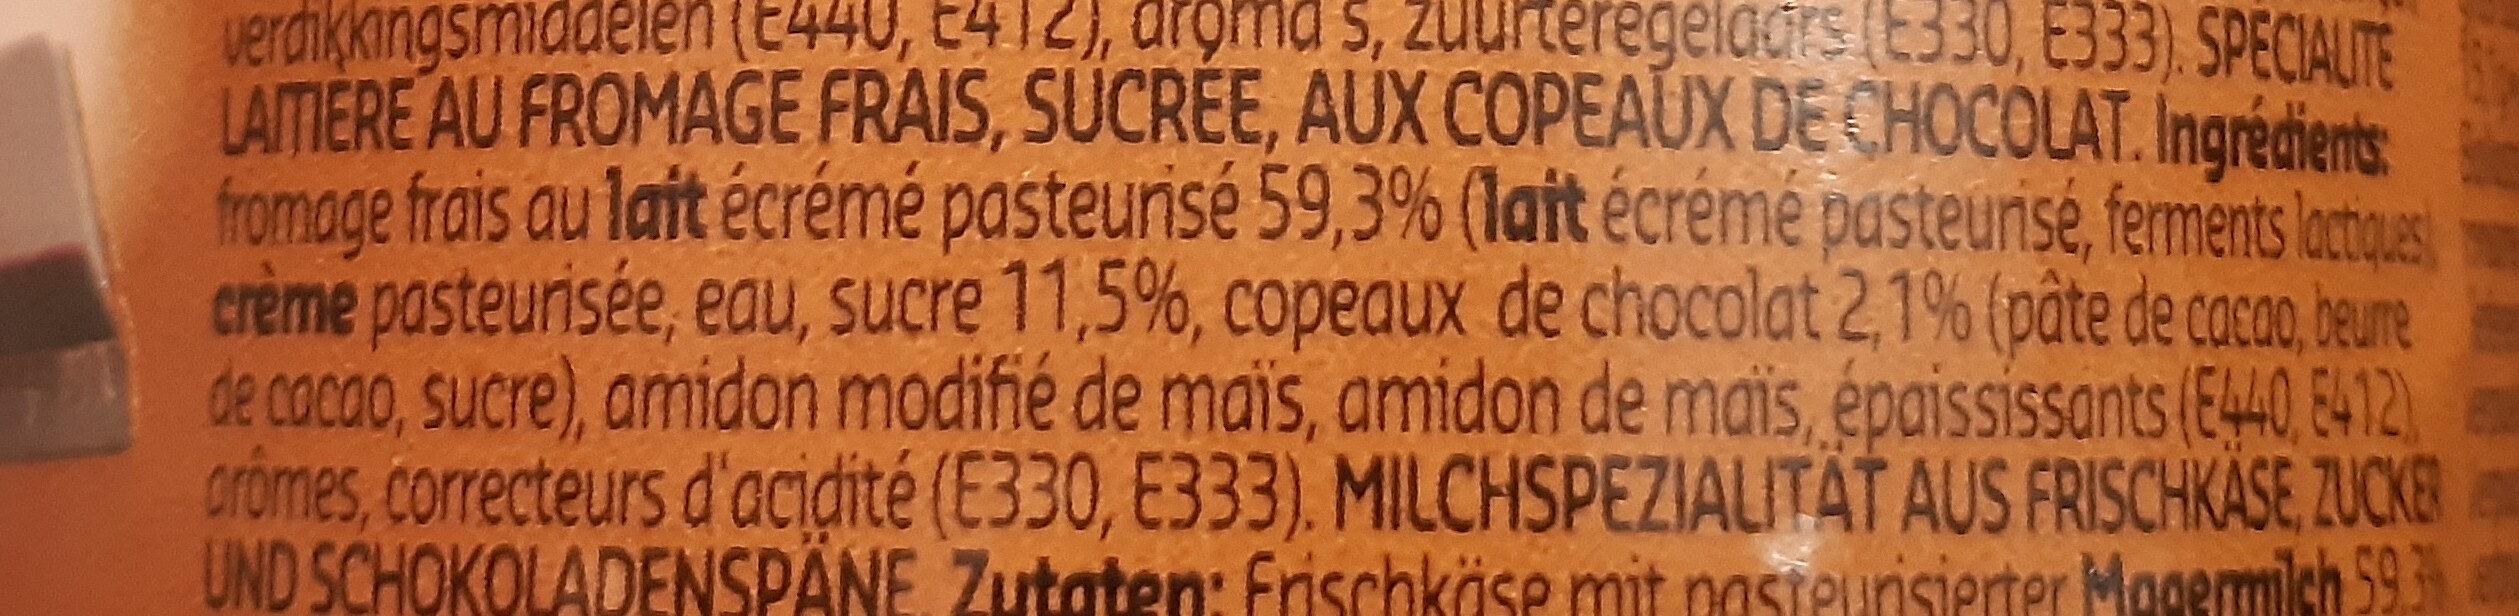 Stracciatella - Ingrediënten - fr